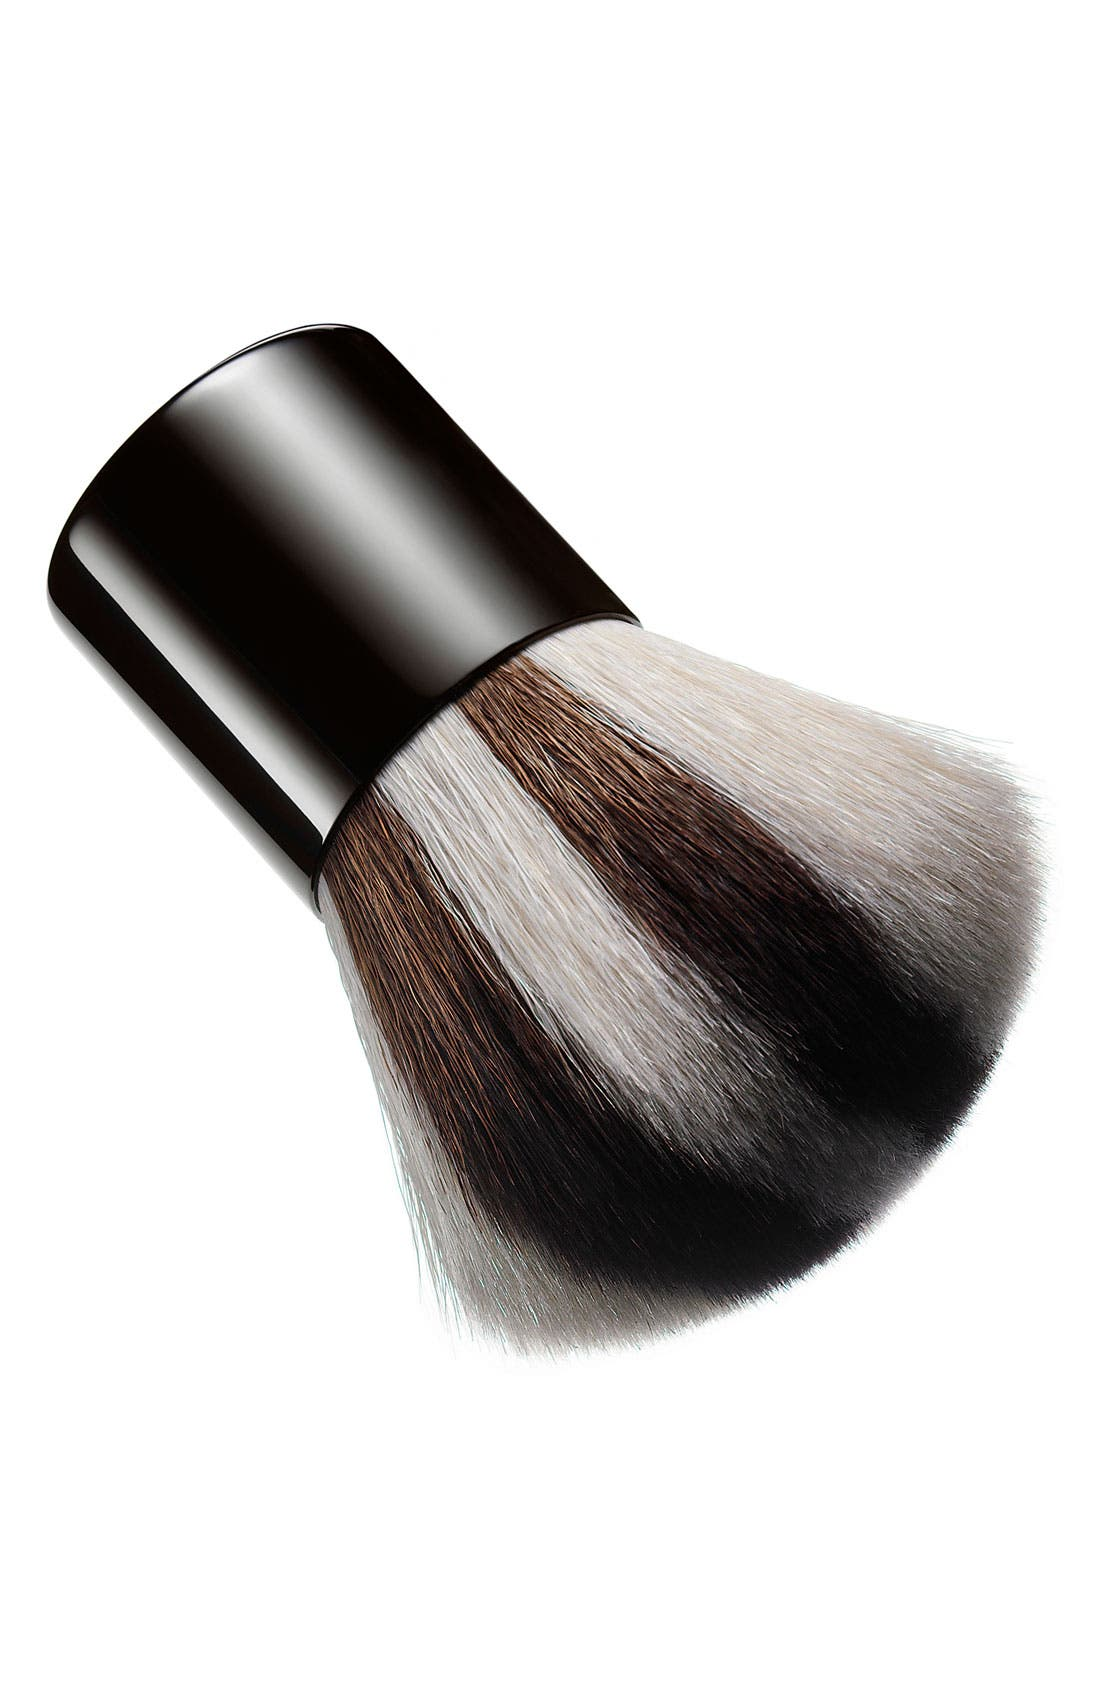 Chantecaille Zebra Kabuki Brush